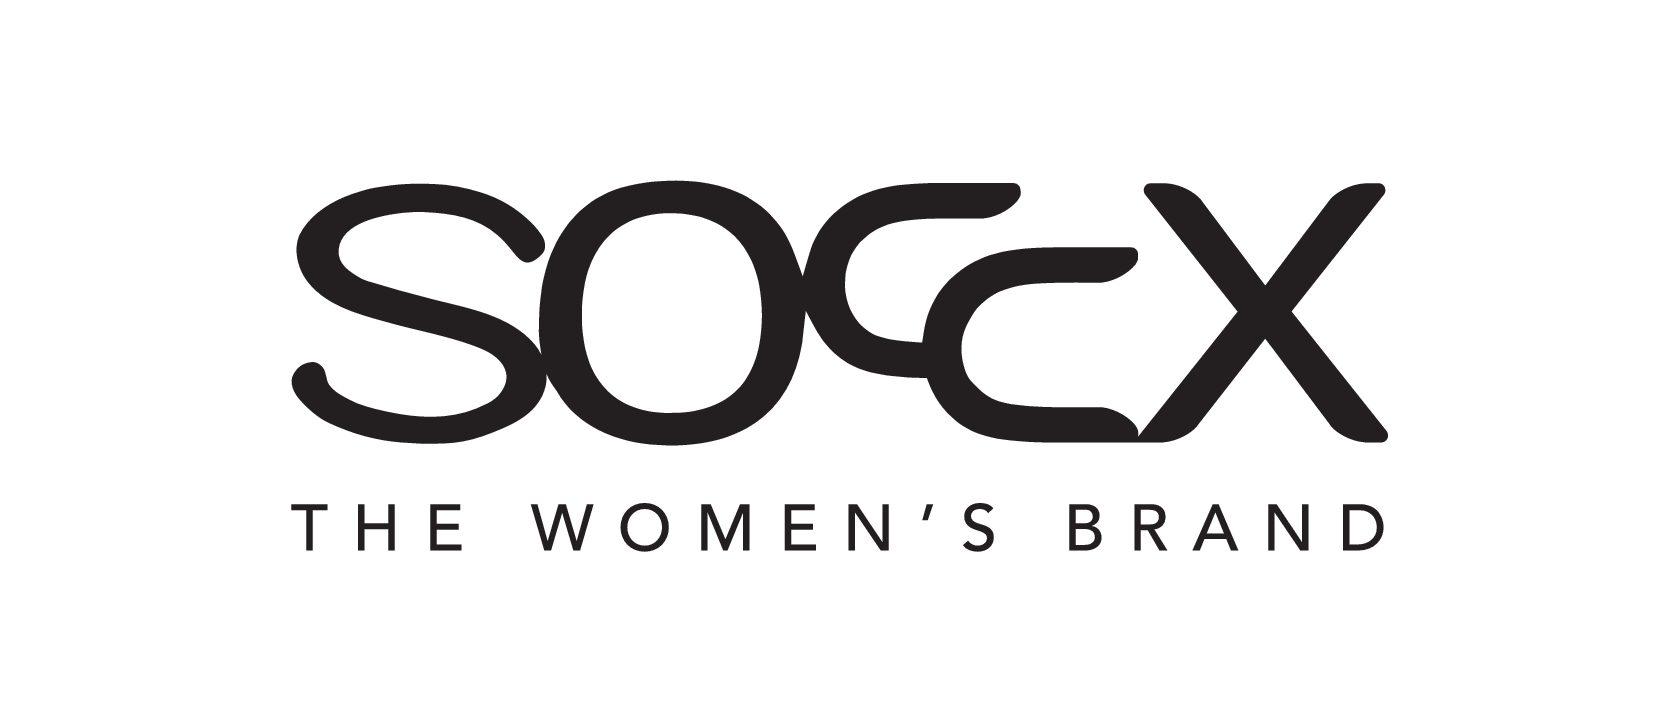 Soccx kommt ab April 2019